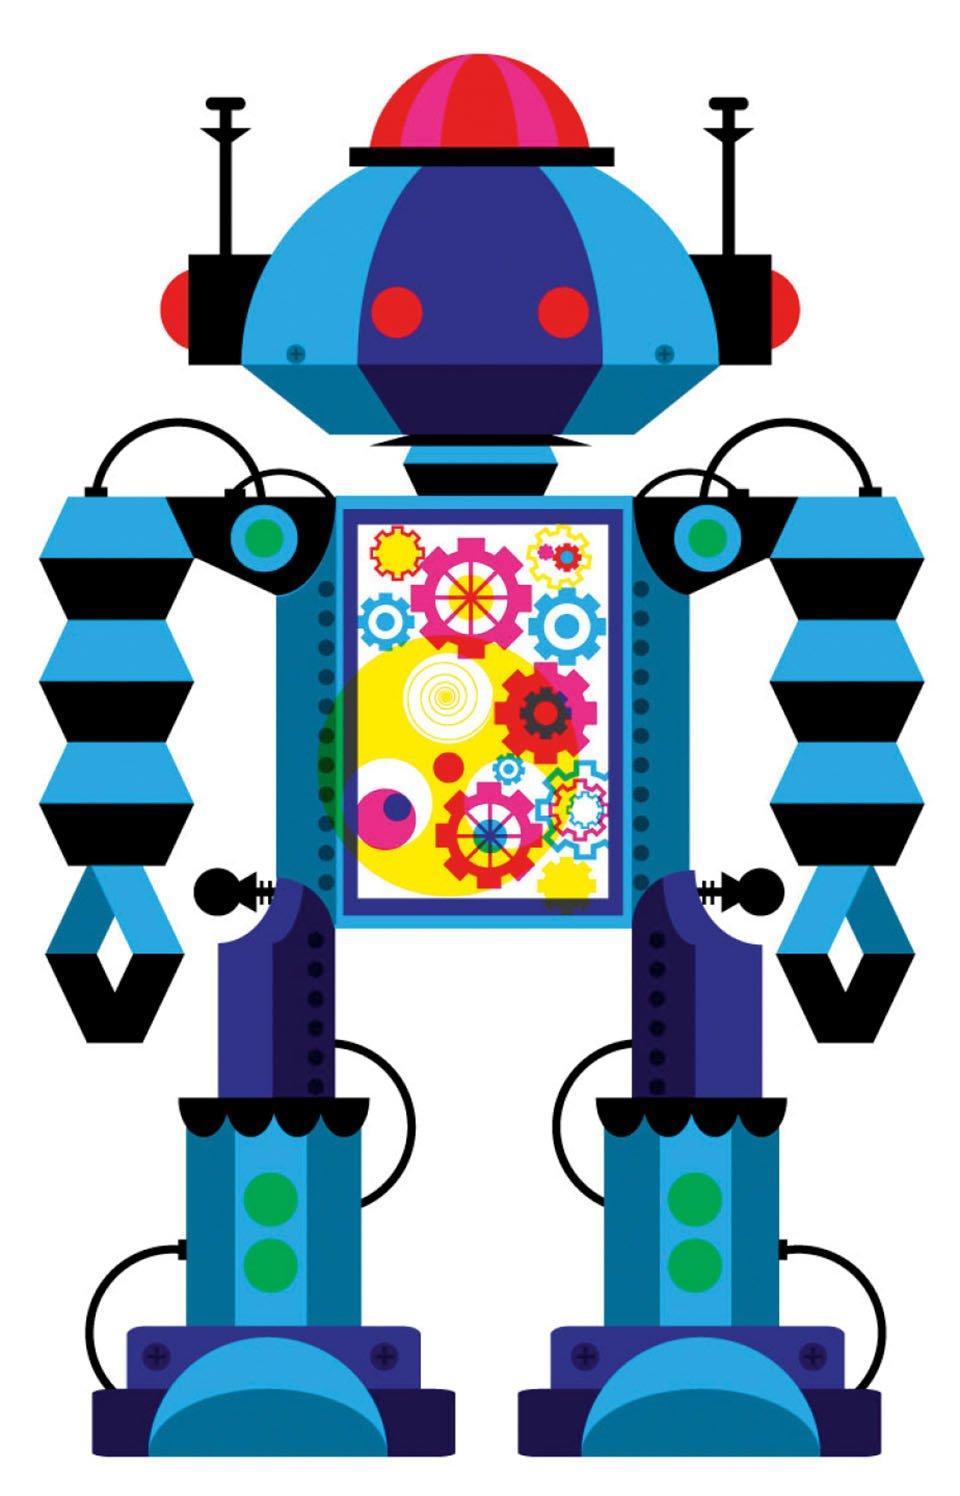 Seite 376: Robot 1, 2011 | Patrick Hruby, Sappi Fine Paper; digital | Copyright: TASCHEN